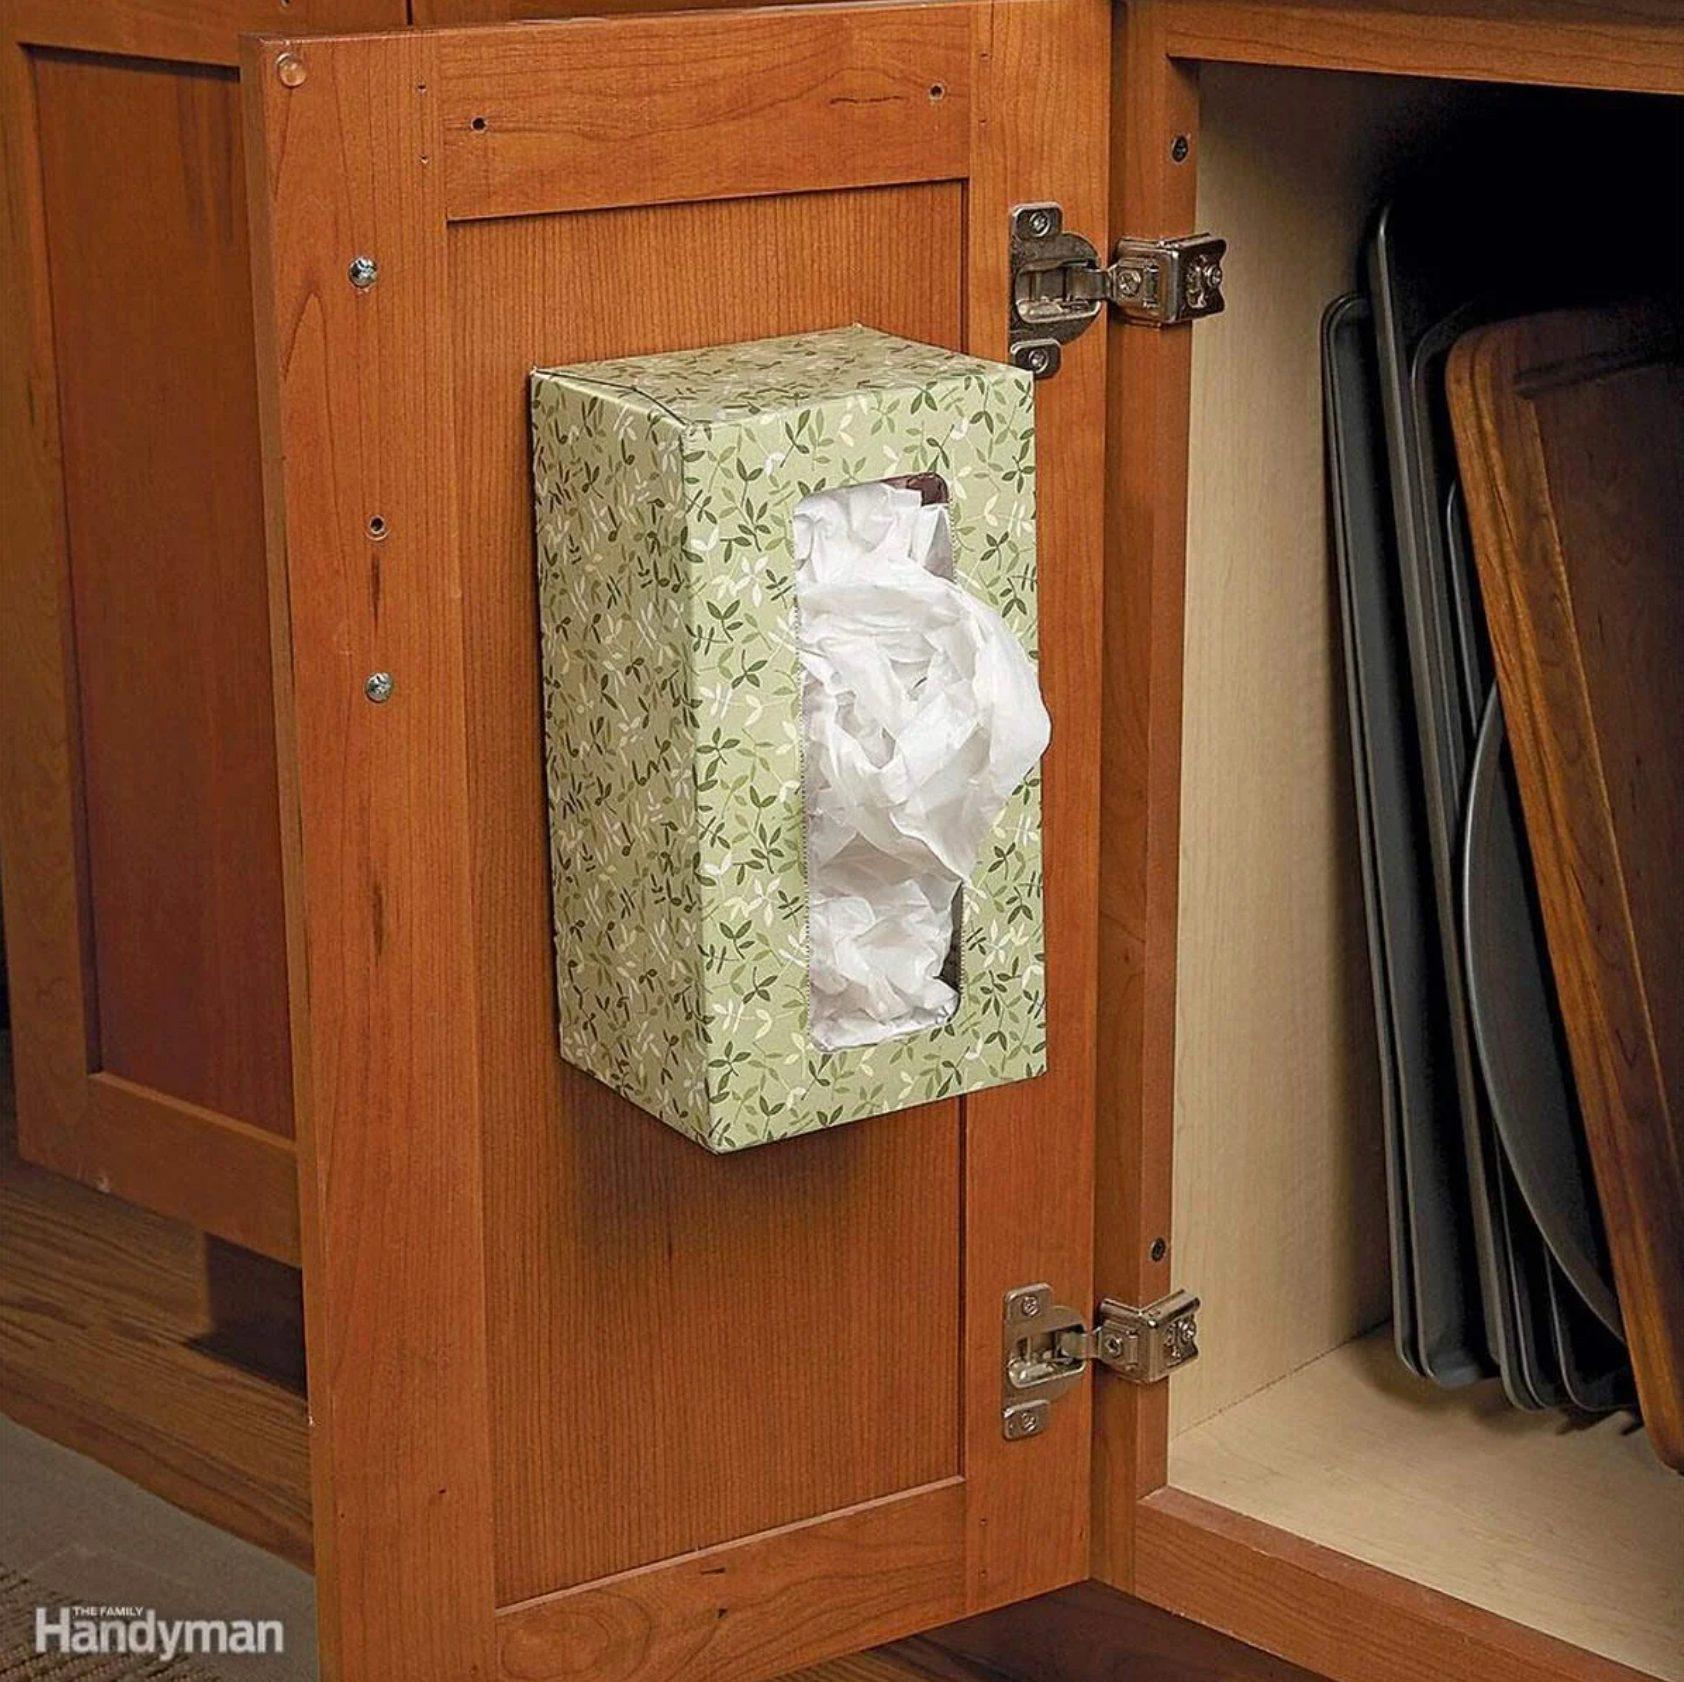 Kitchen Organizing Ideas - plastic Bag Holder